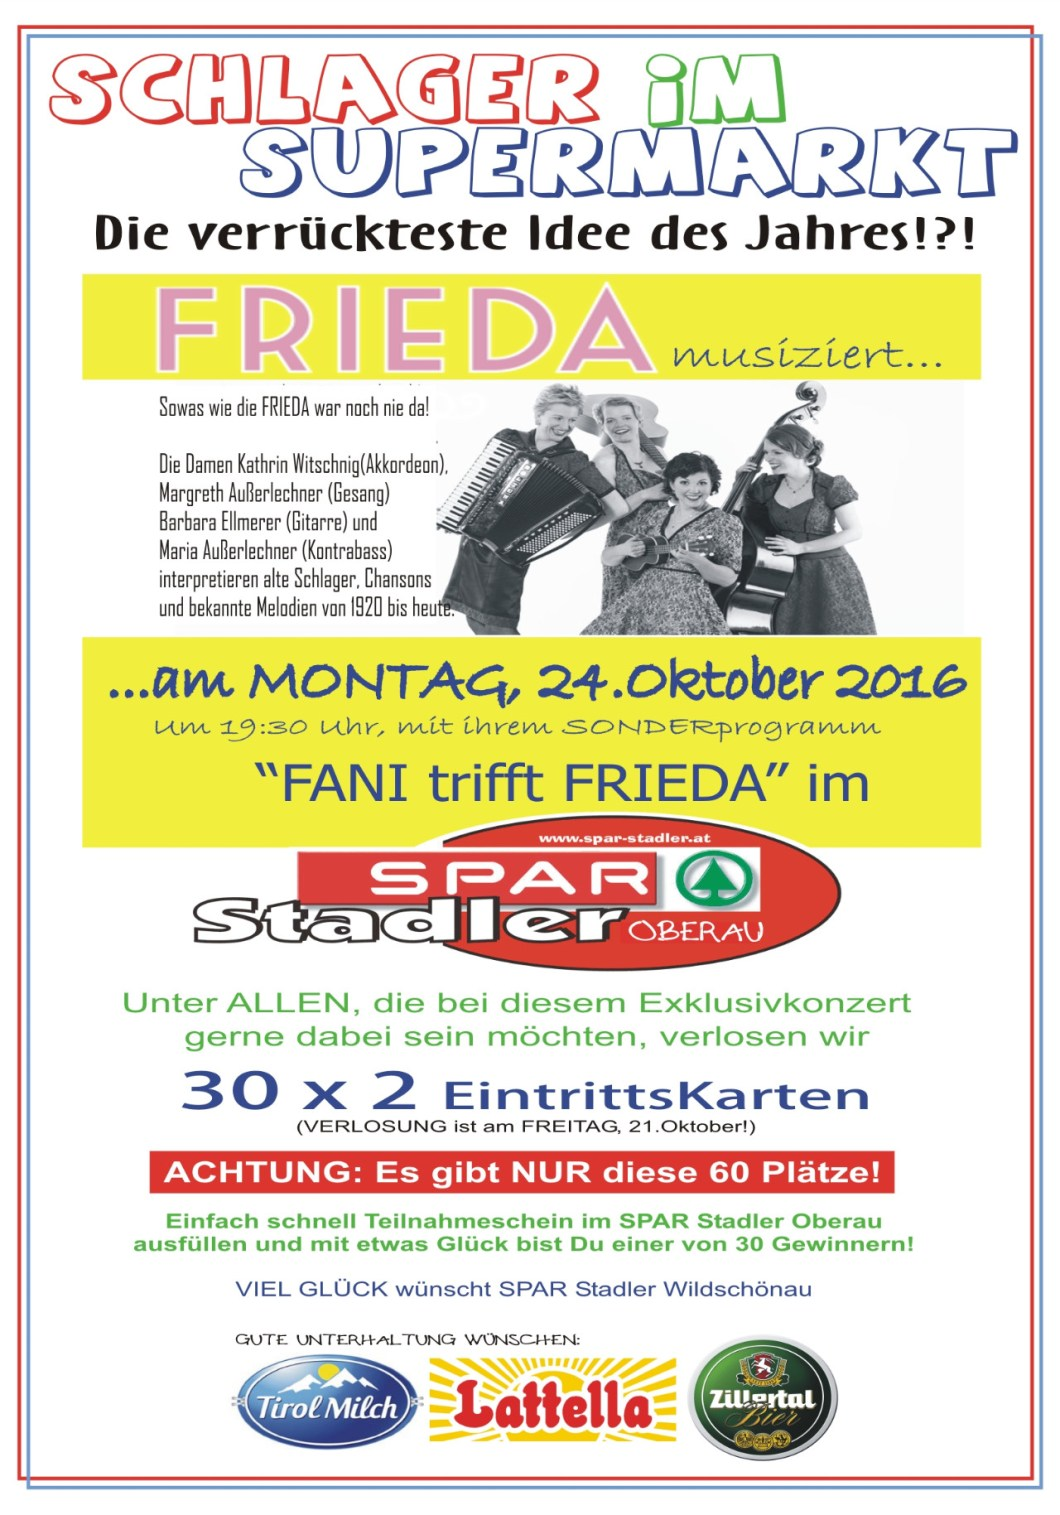 frieda-im-supermarkt-plakat